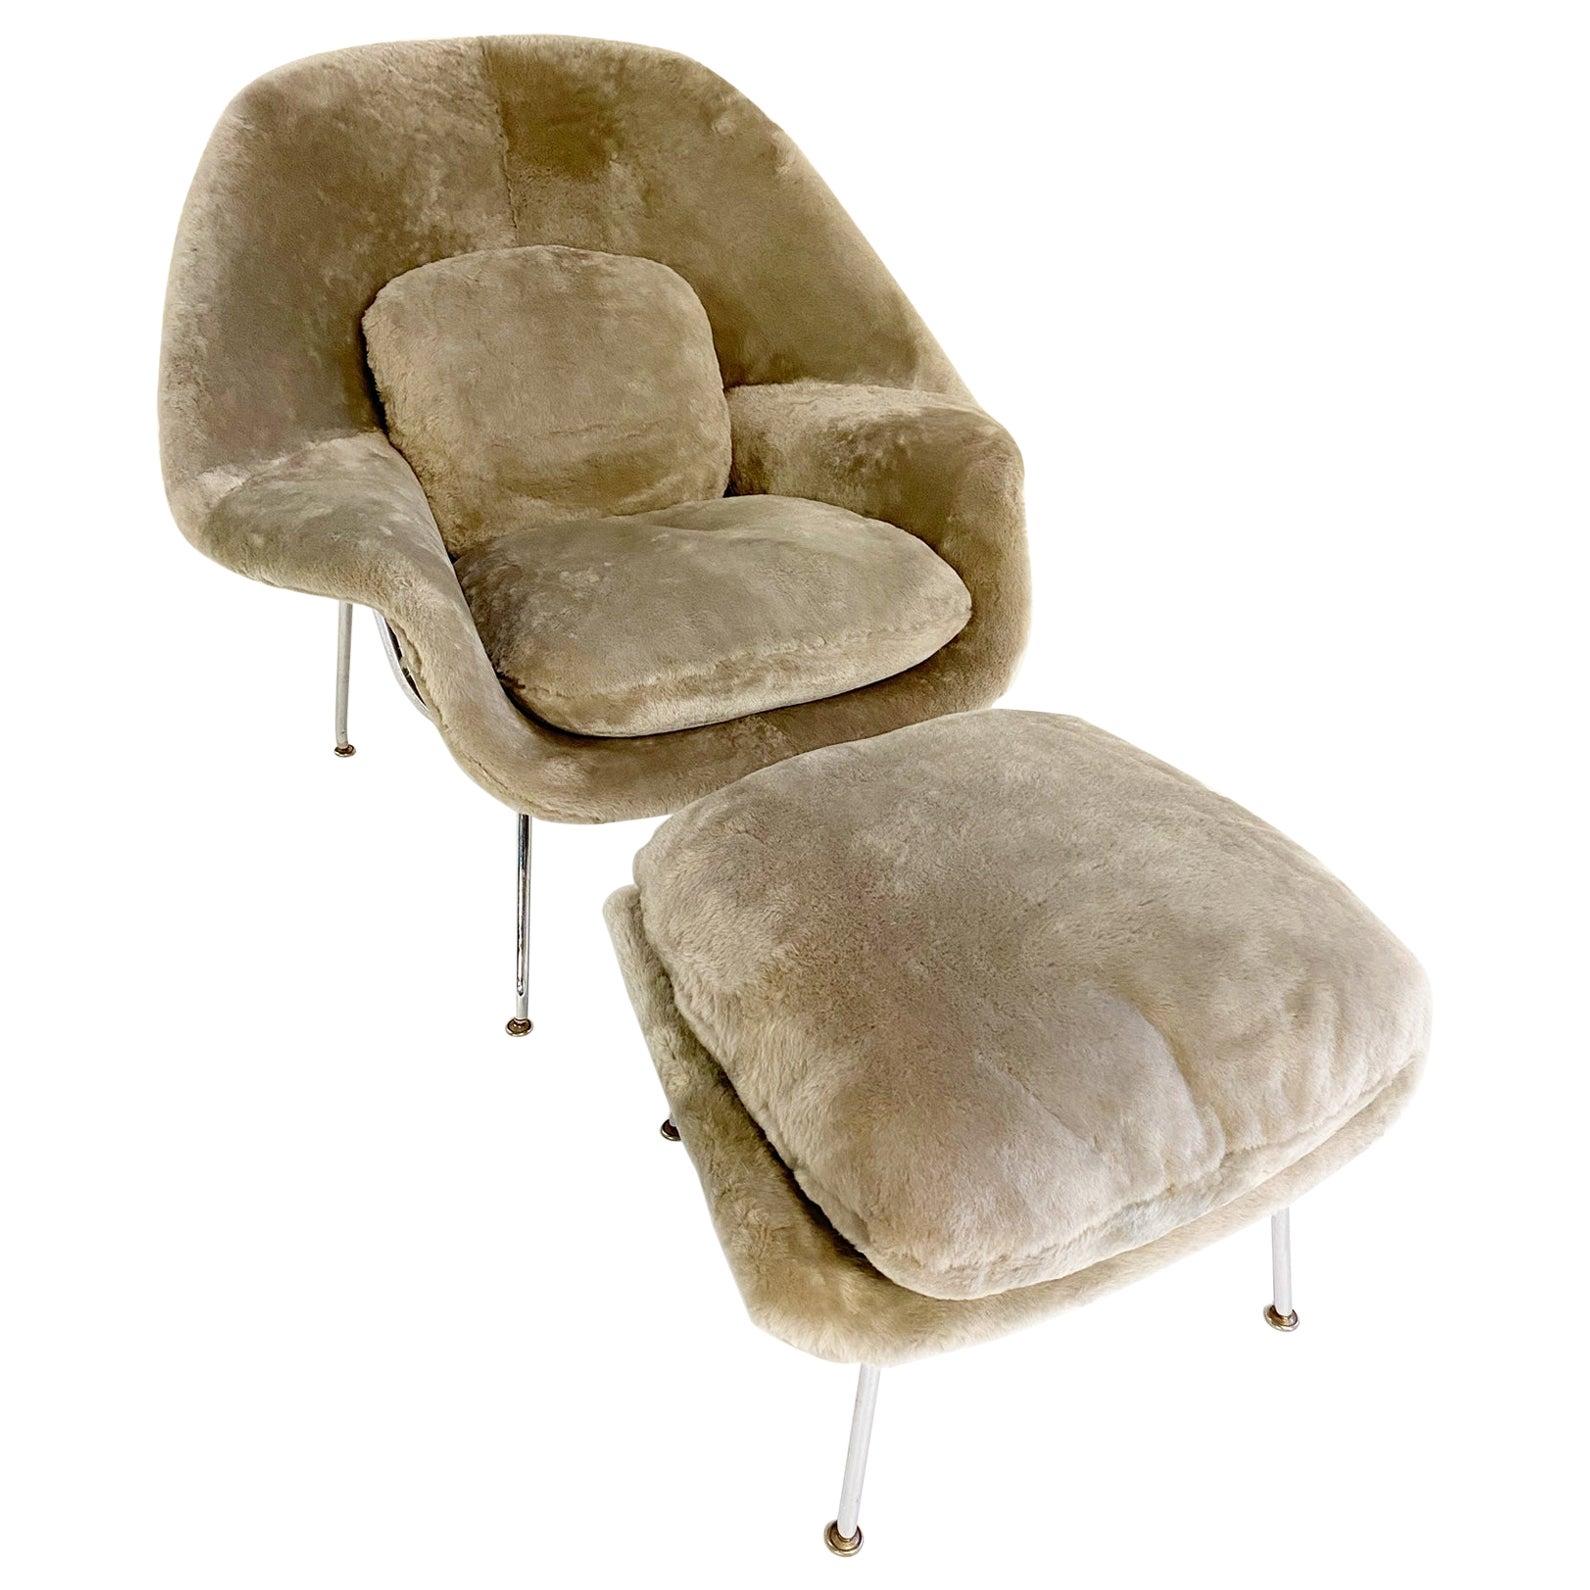 Bespoke Eero Saarinen Womb Chair and Ottoman in Shearling